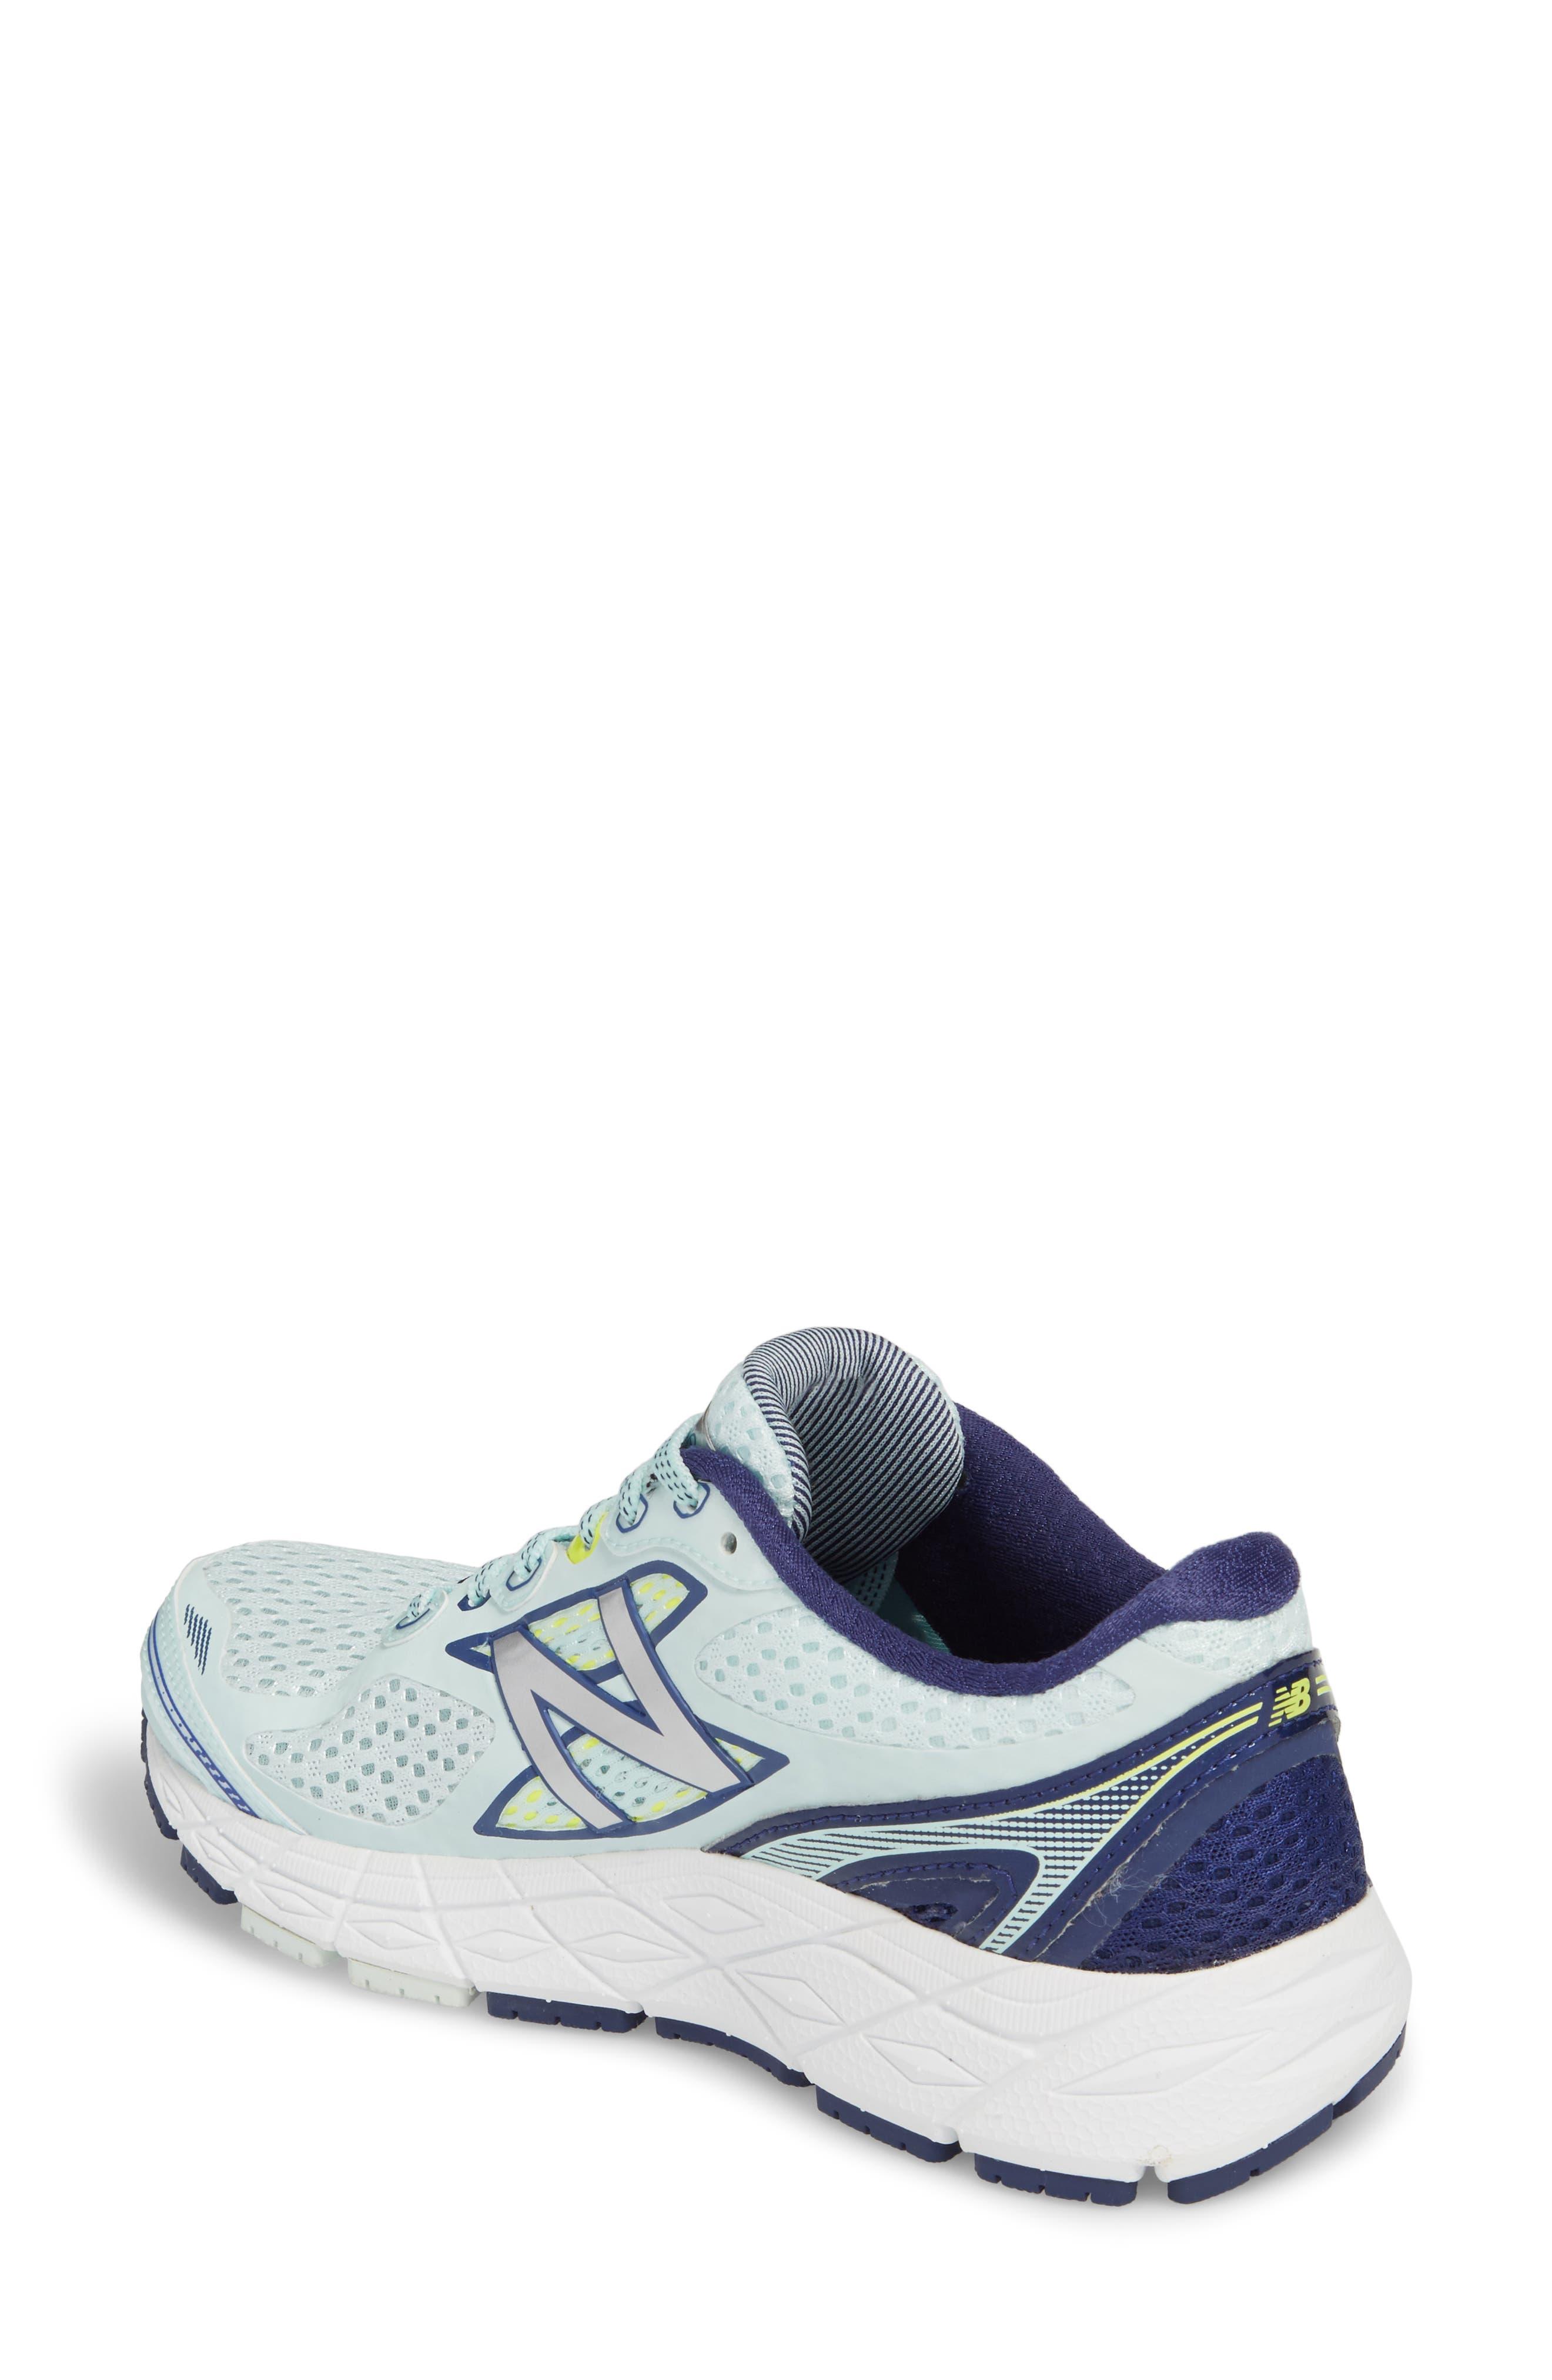 '840v3' Running Shoe,                             Alternate thumbnail 2, color,                             DROPLET